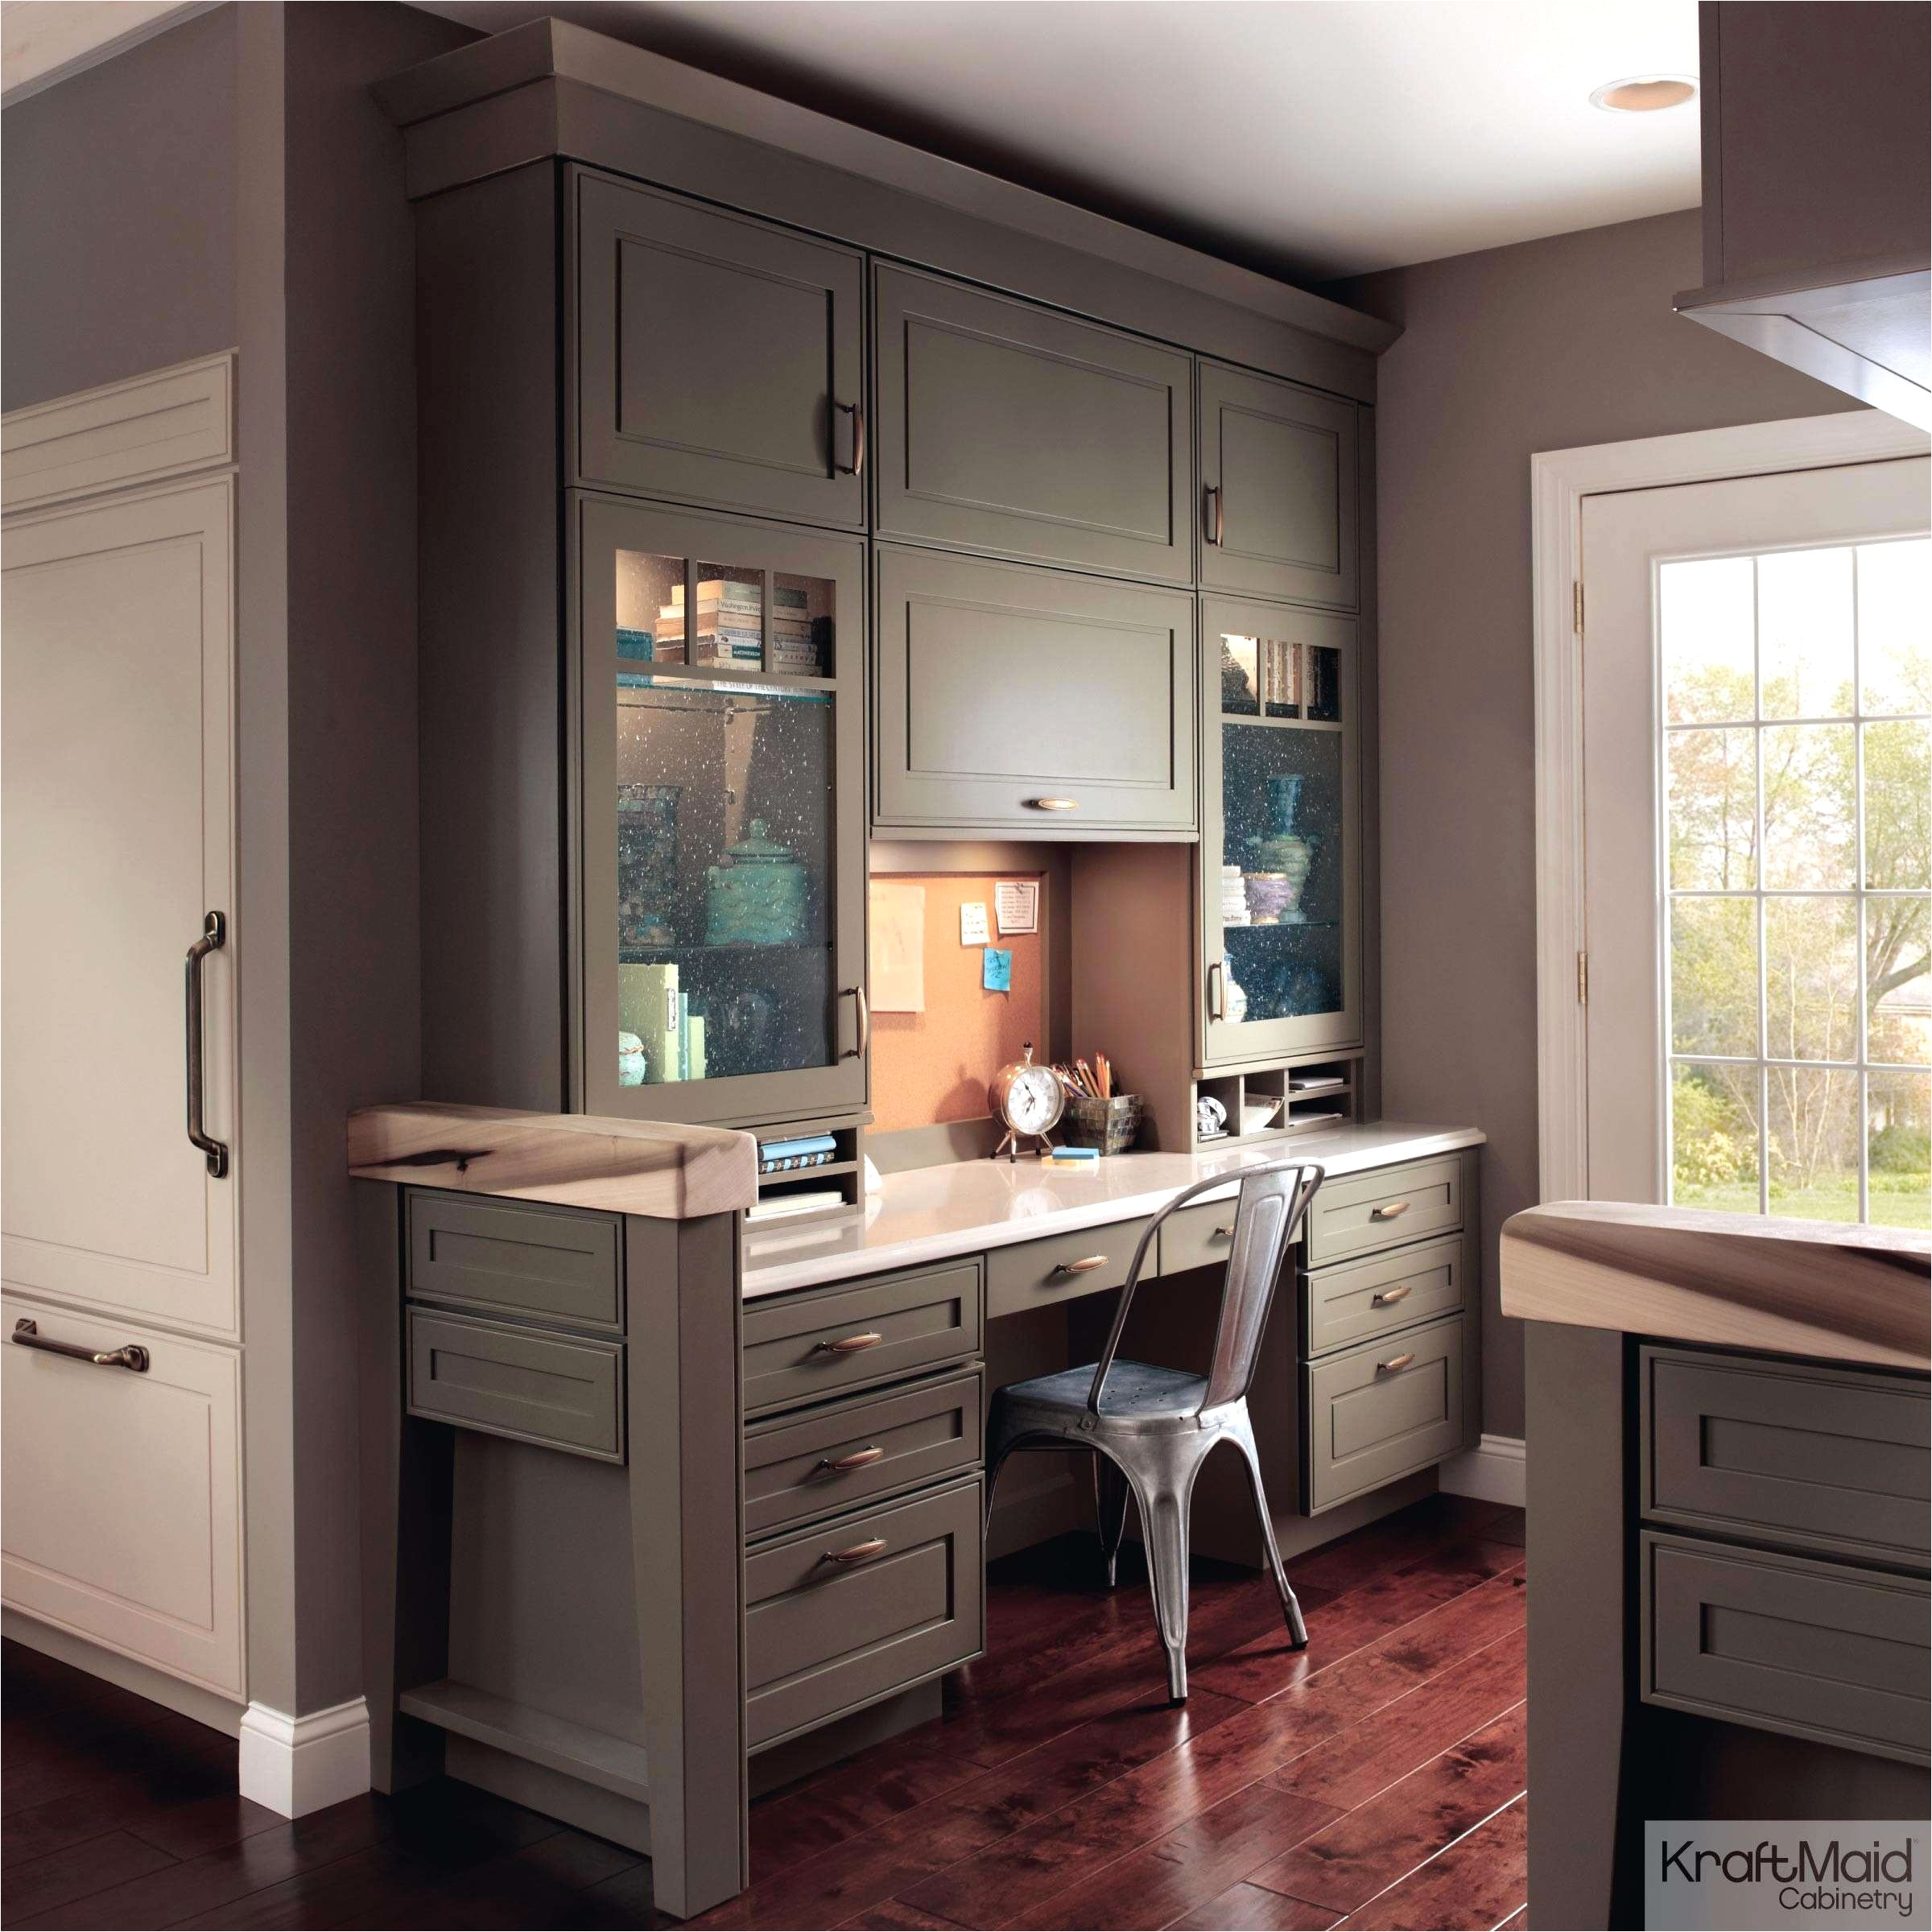 pickled maple kitchen cabinets awesome kitchen cabinet 0d kitchen inspiration upper corner kitchen cabinet organization